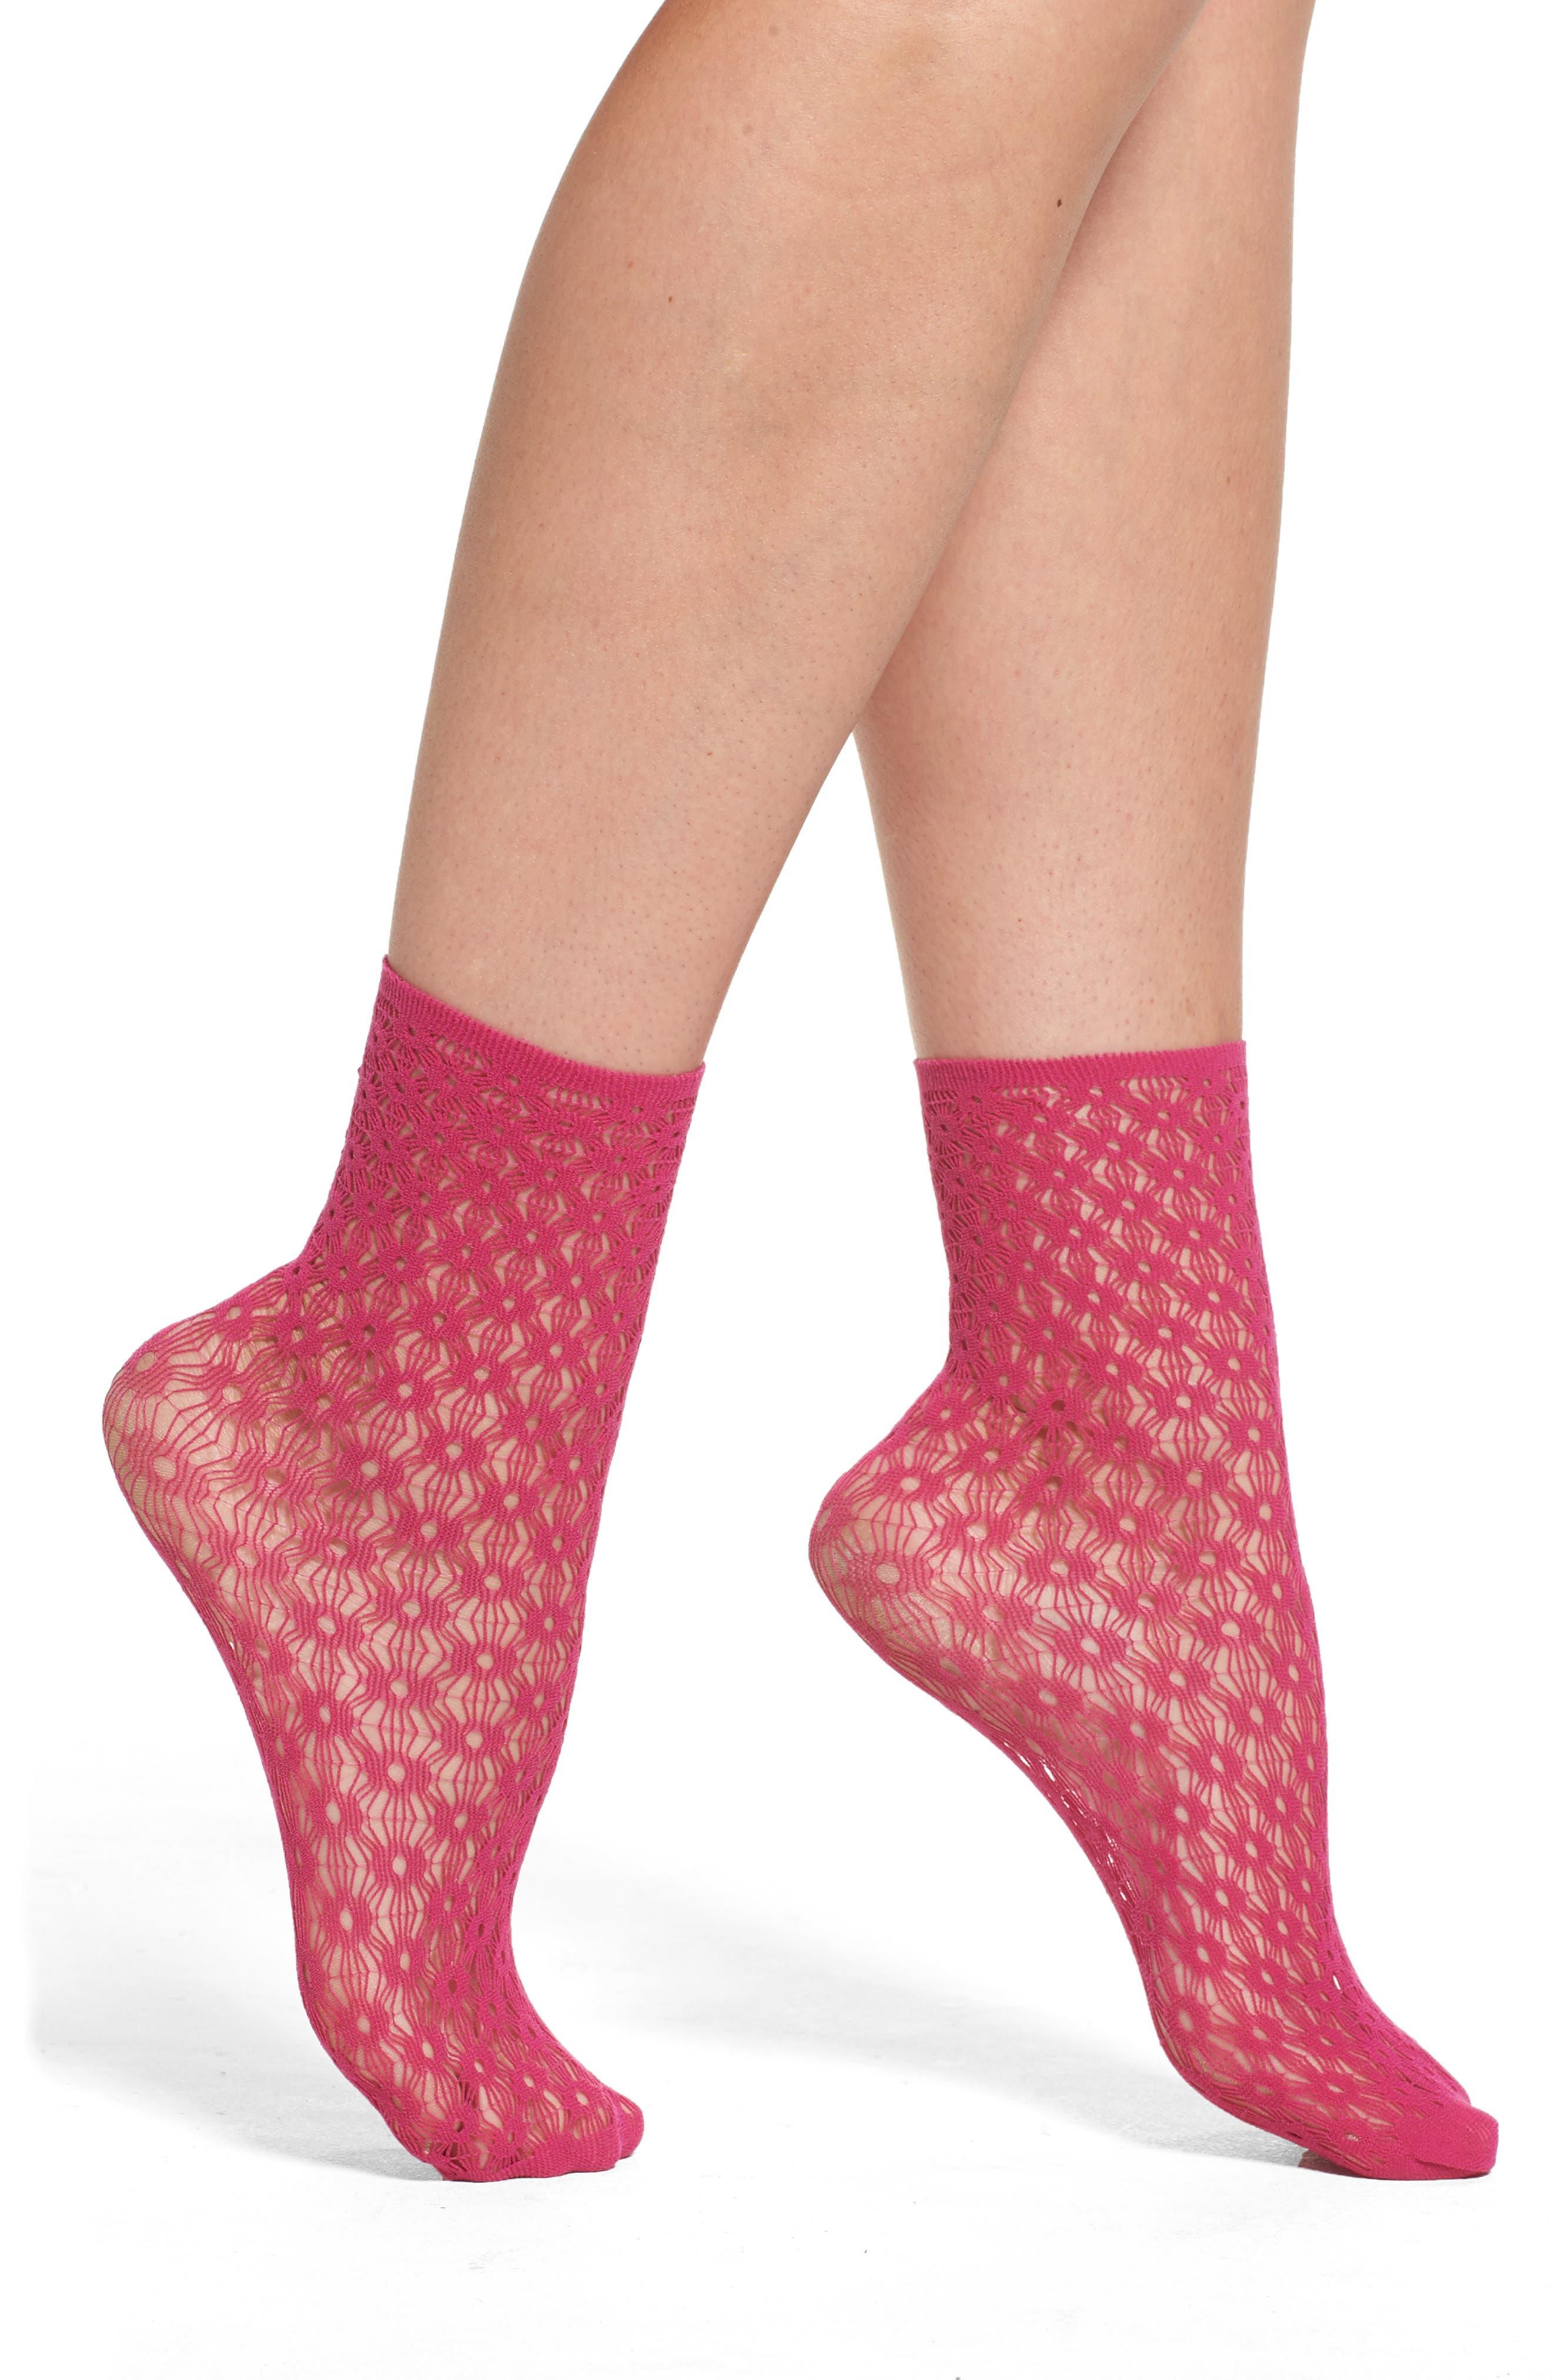 Sarah Borghi Elisa Ankle Socks